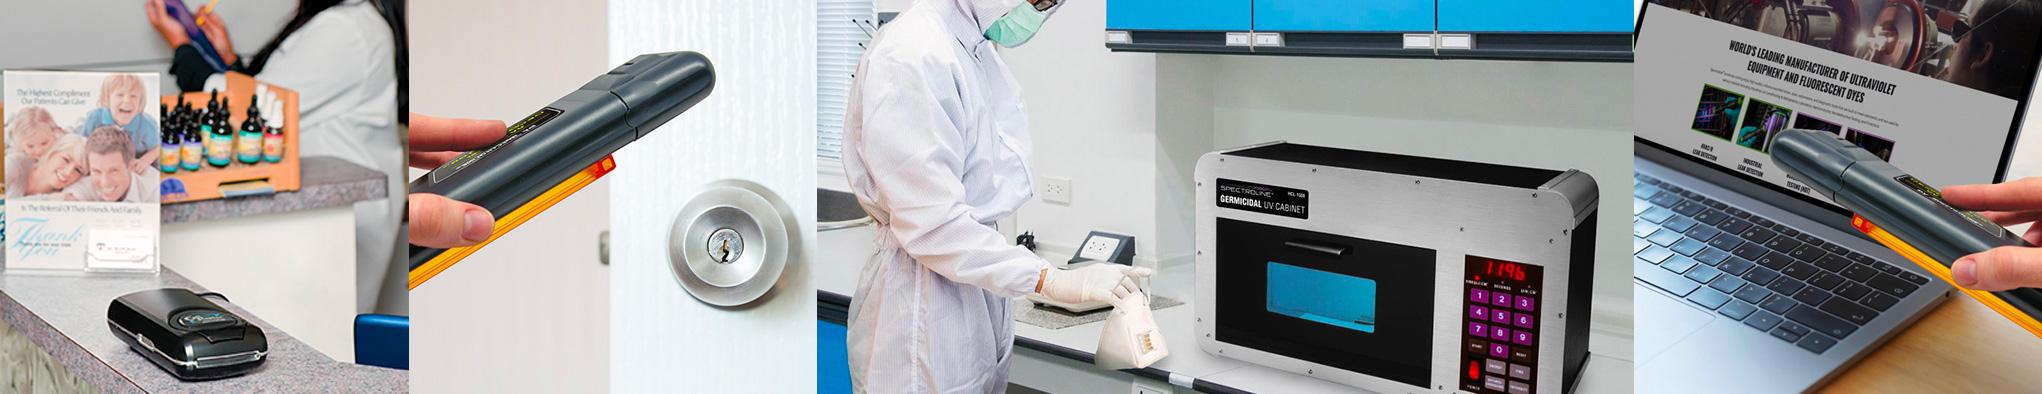 UV-C Sanitizers